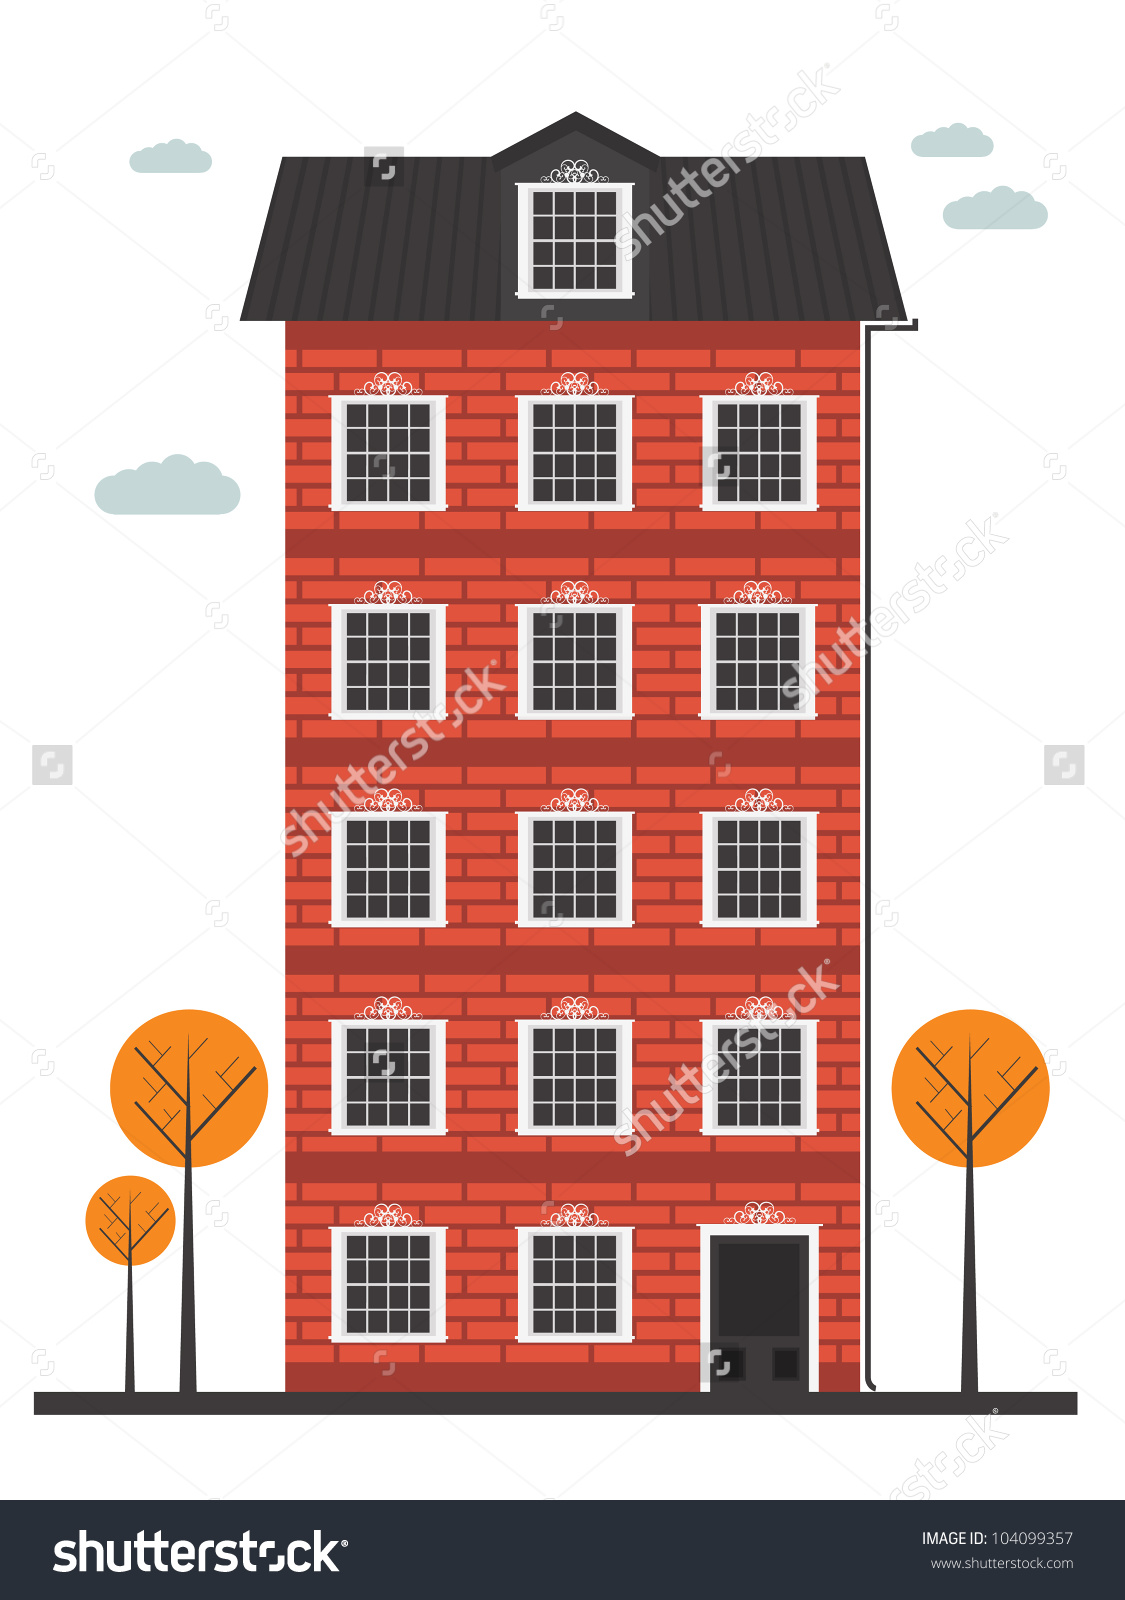 Brick illustration on perfect. Apartment clipart building design